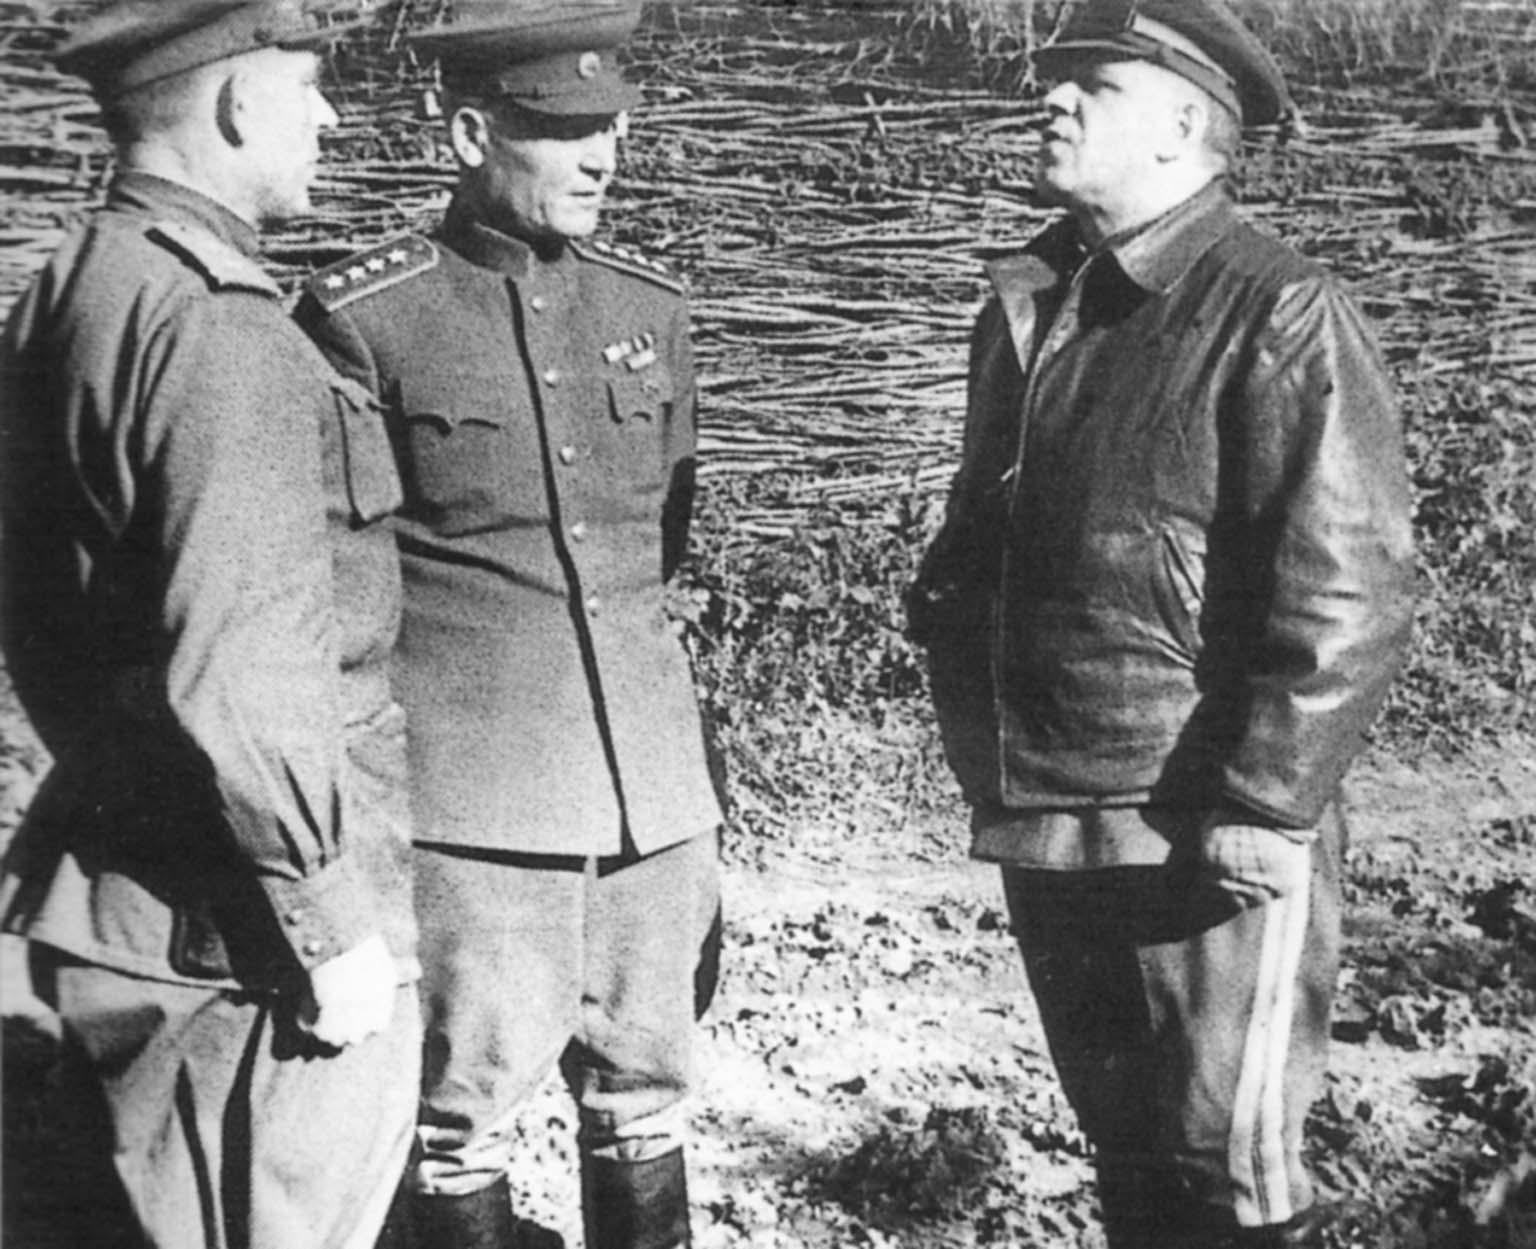 George Zhukov, Ivan Konev